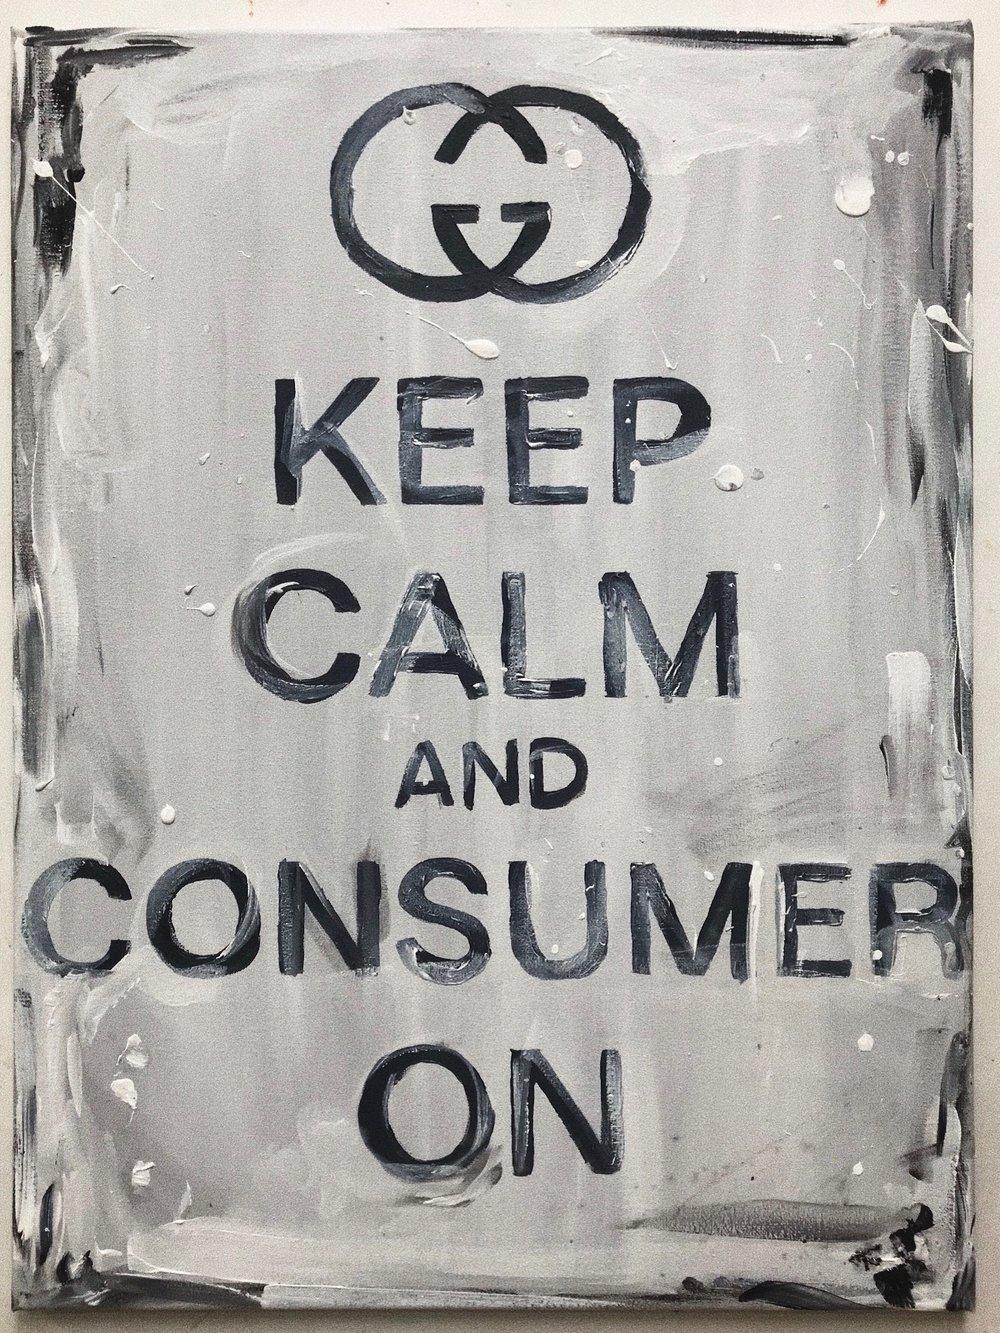 Consumer On